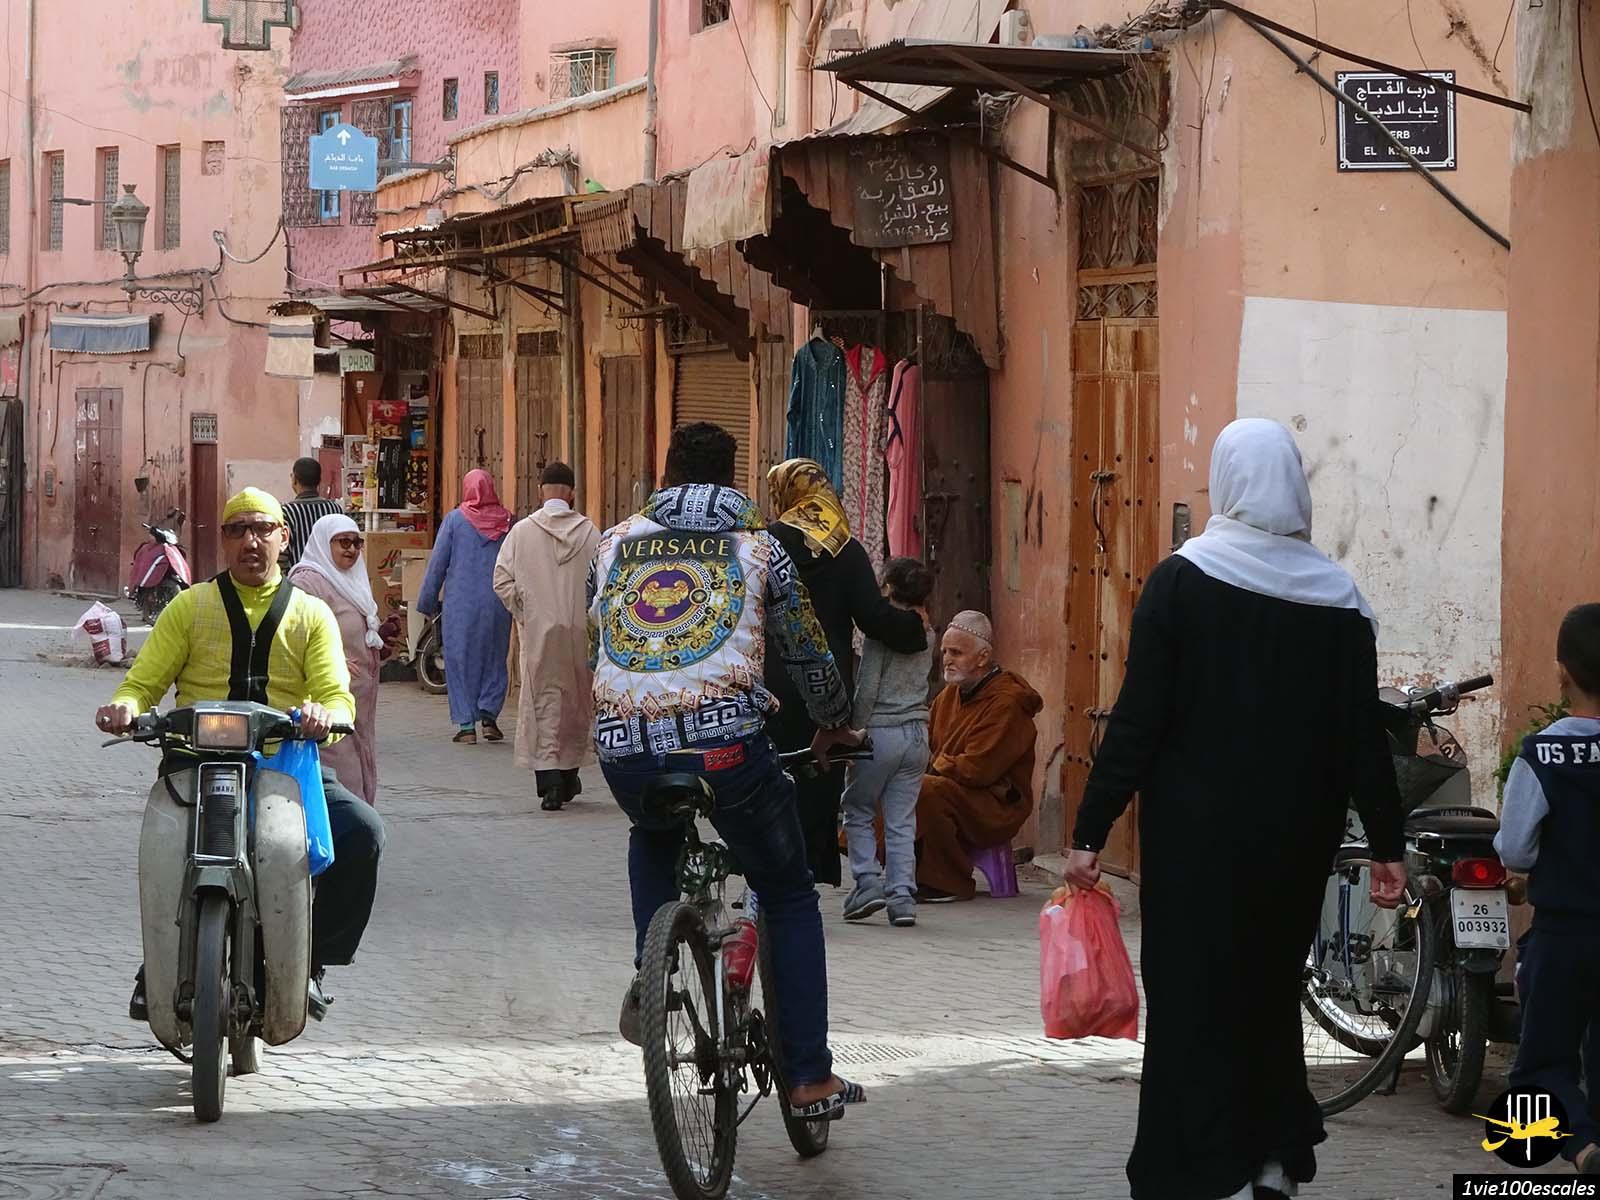 La vie de rue dans la médina de Marrakech